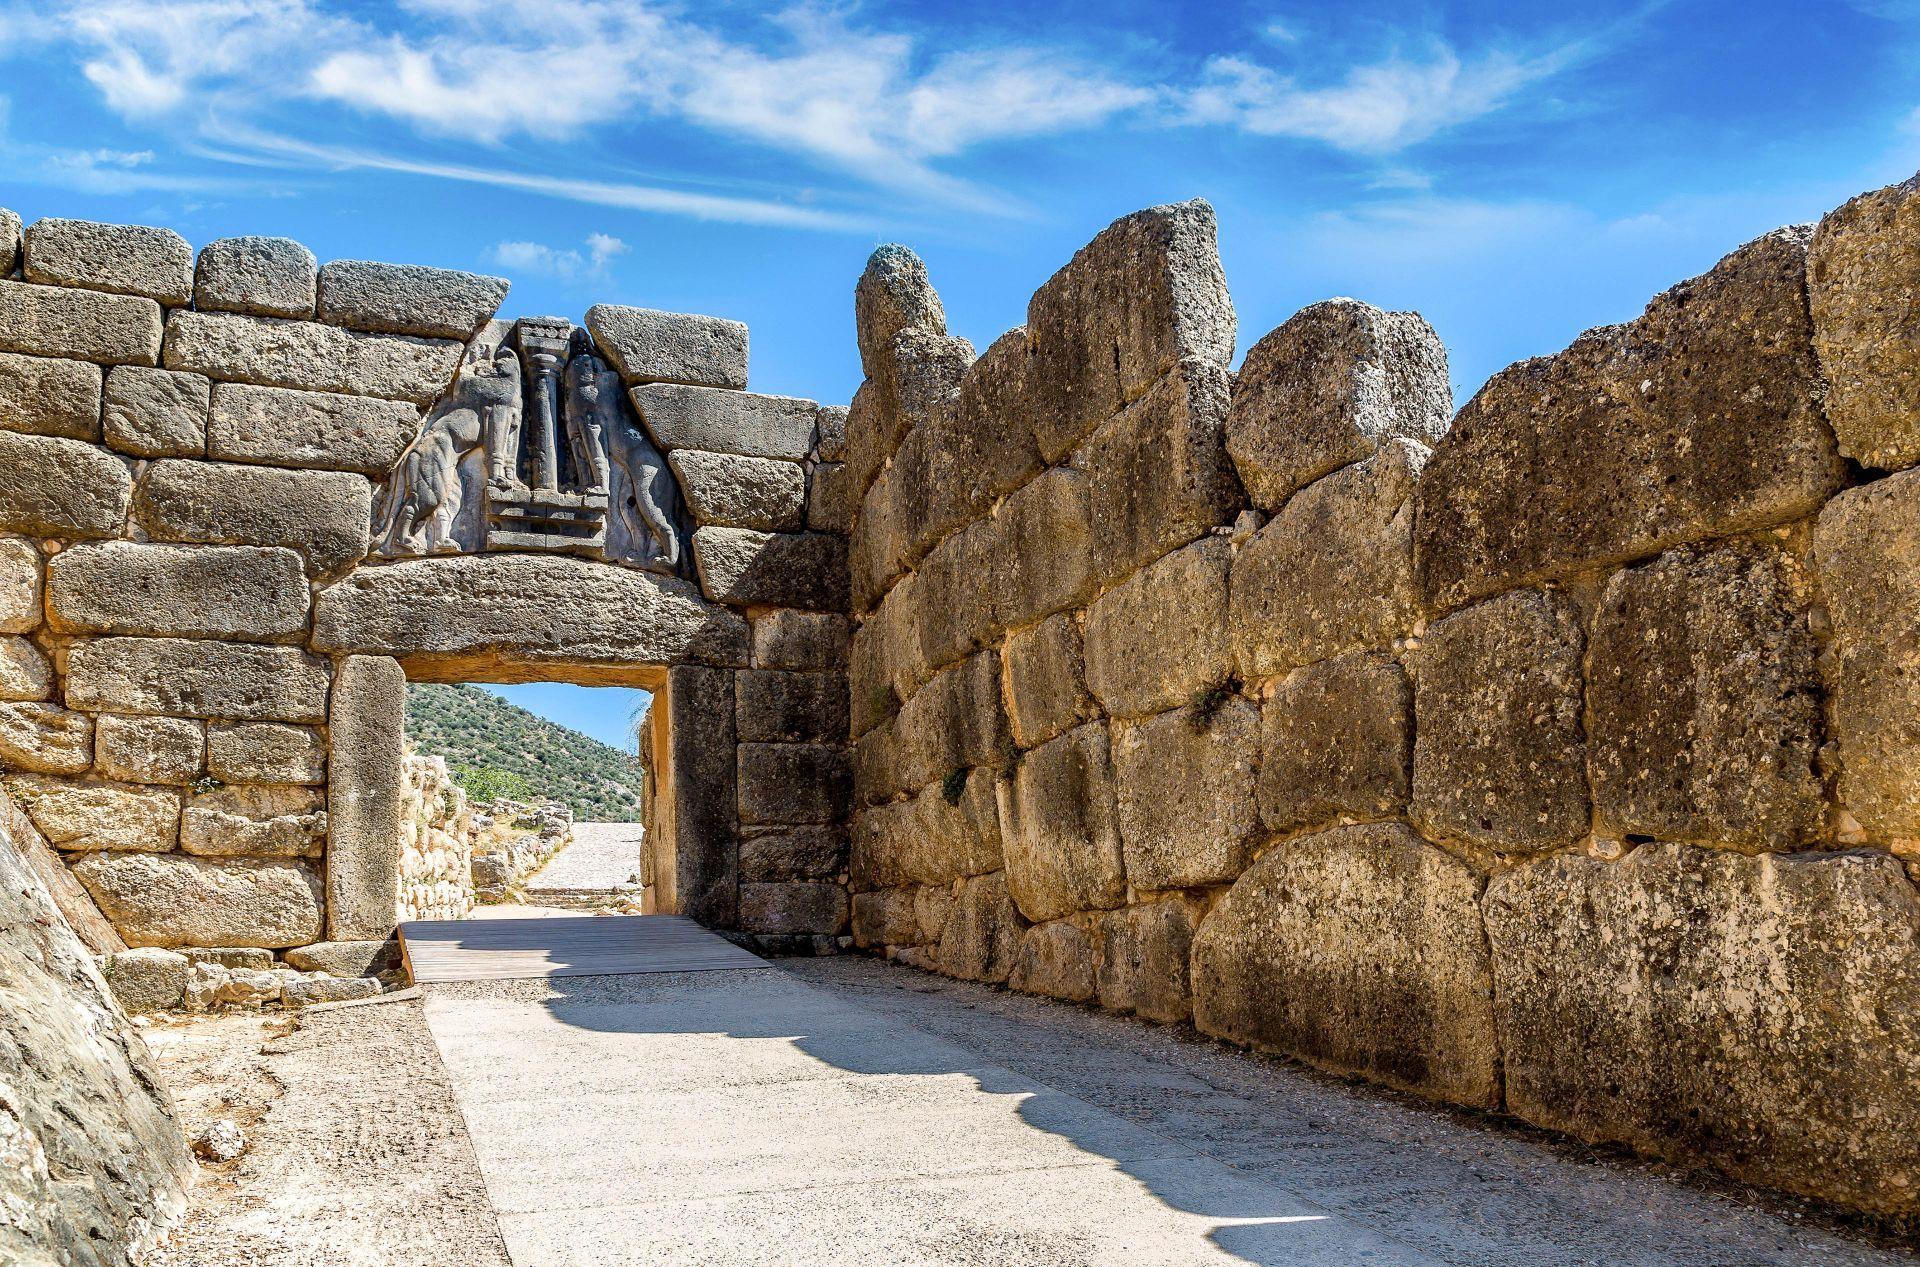 Peloponnese: The Lion Gate in Mycenae